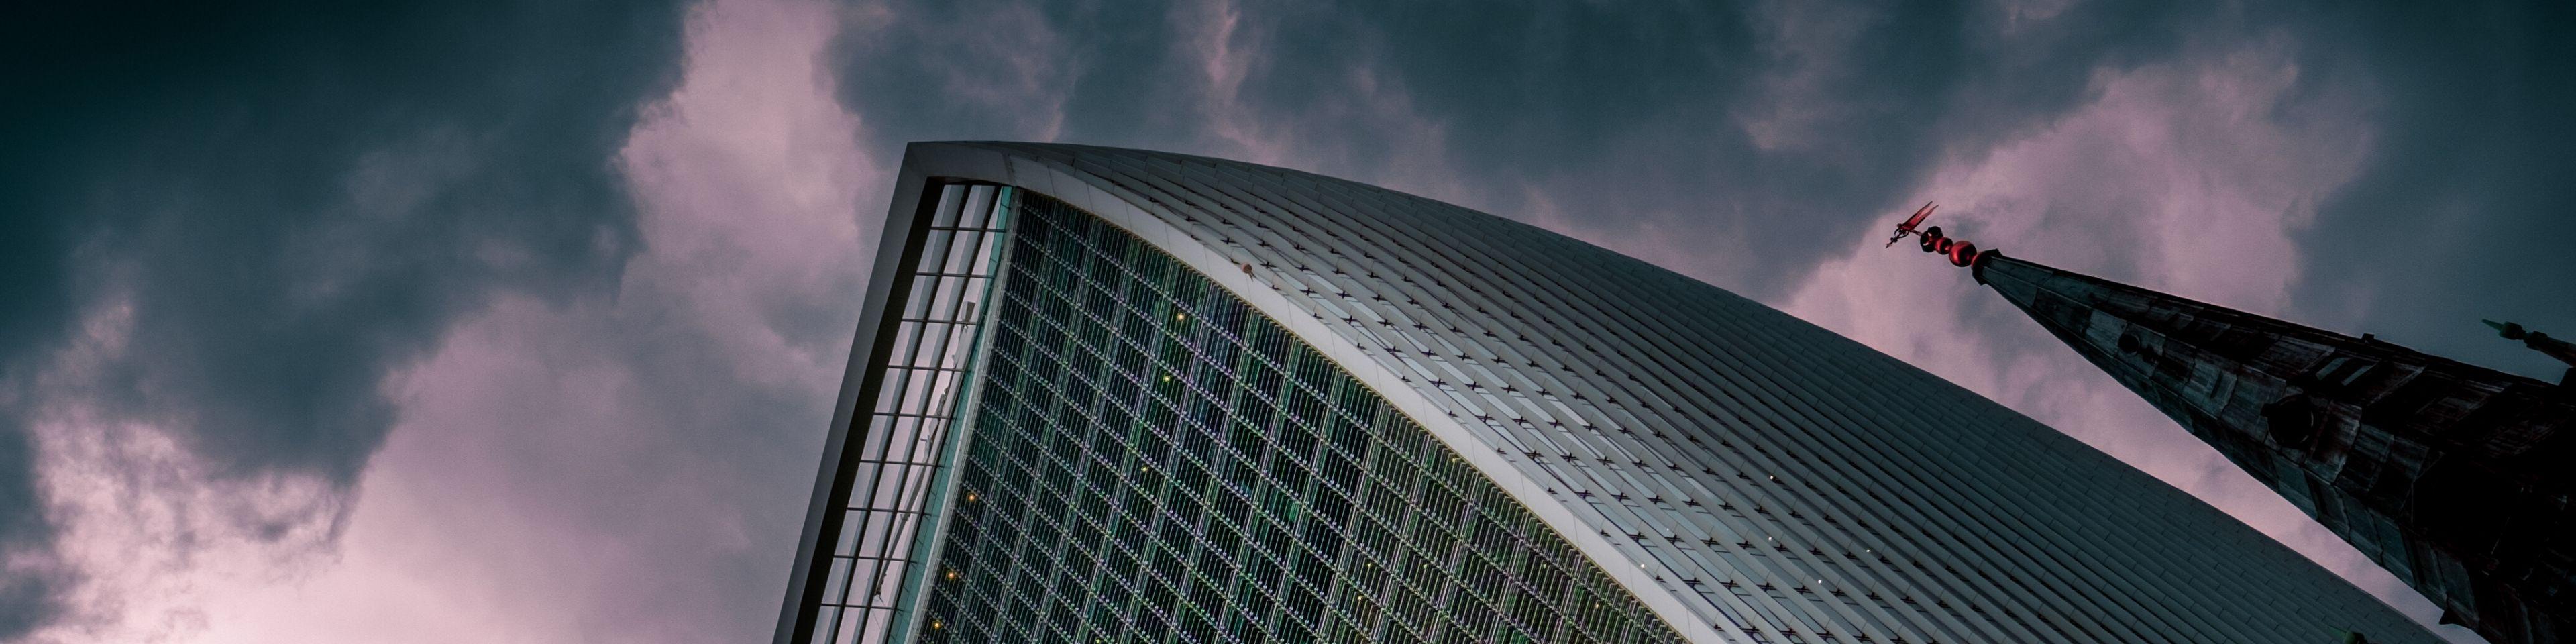 city building dark sky